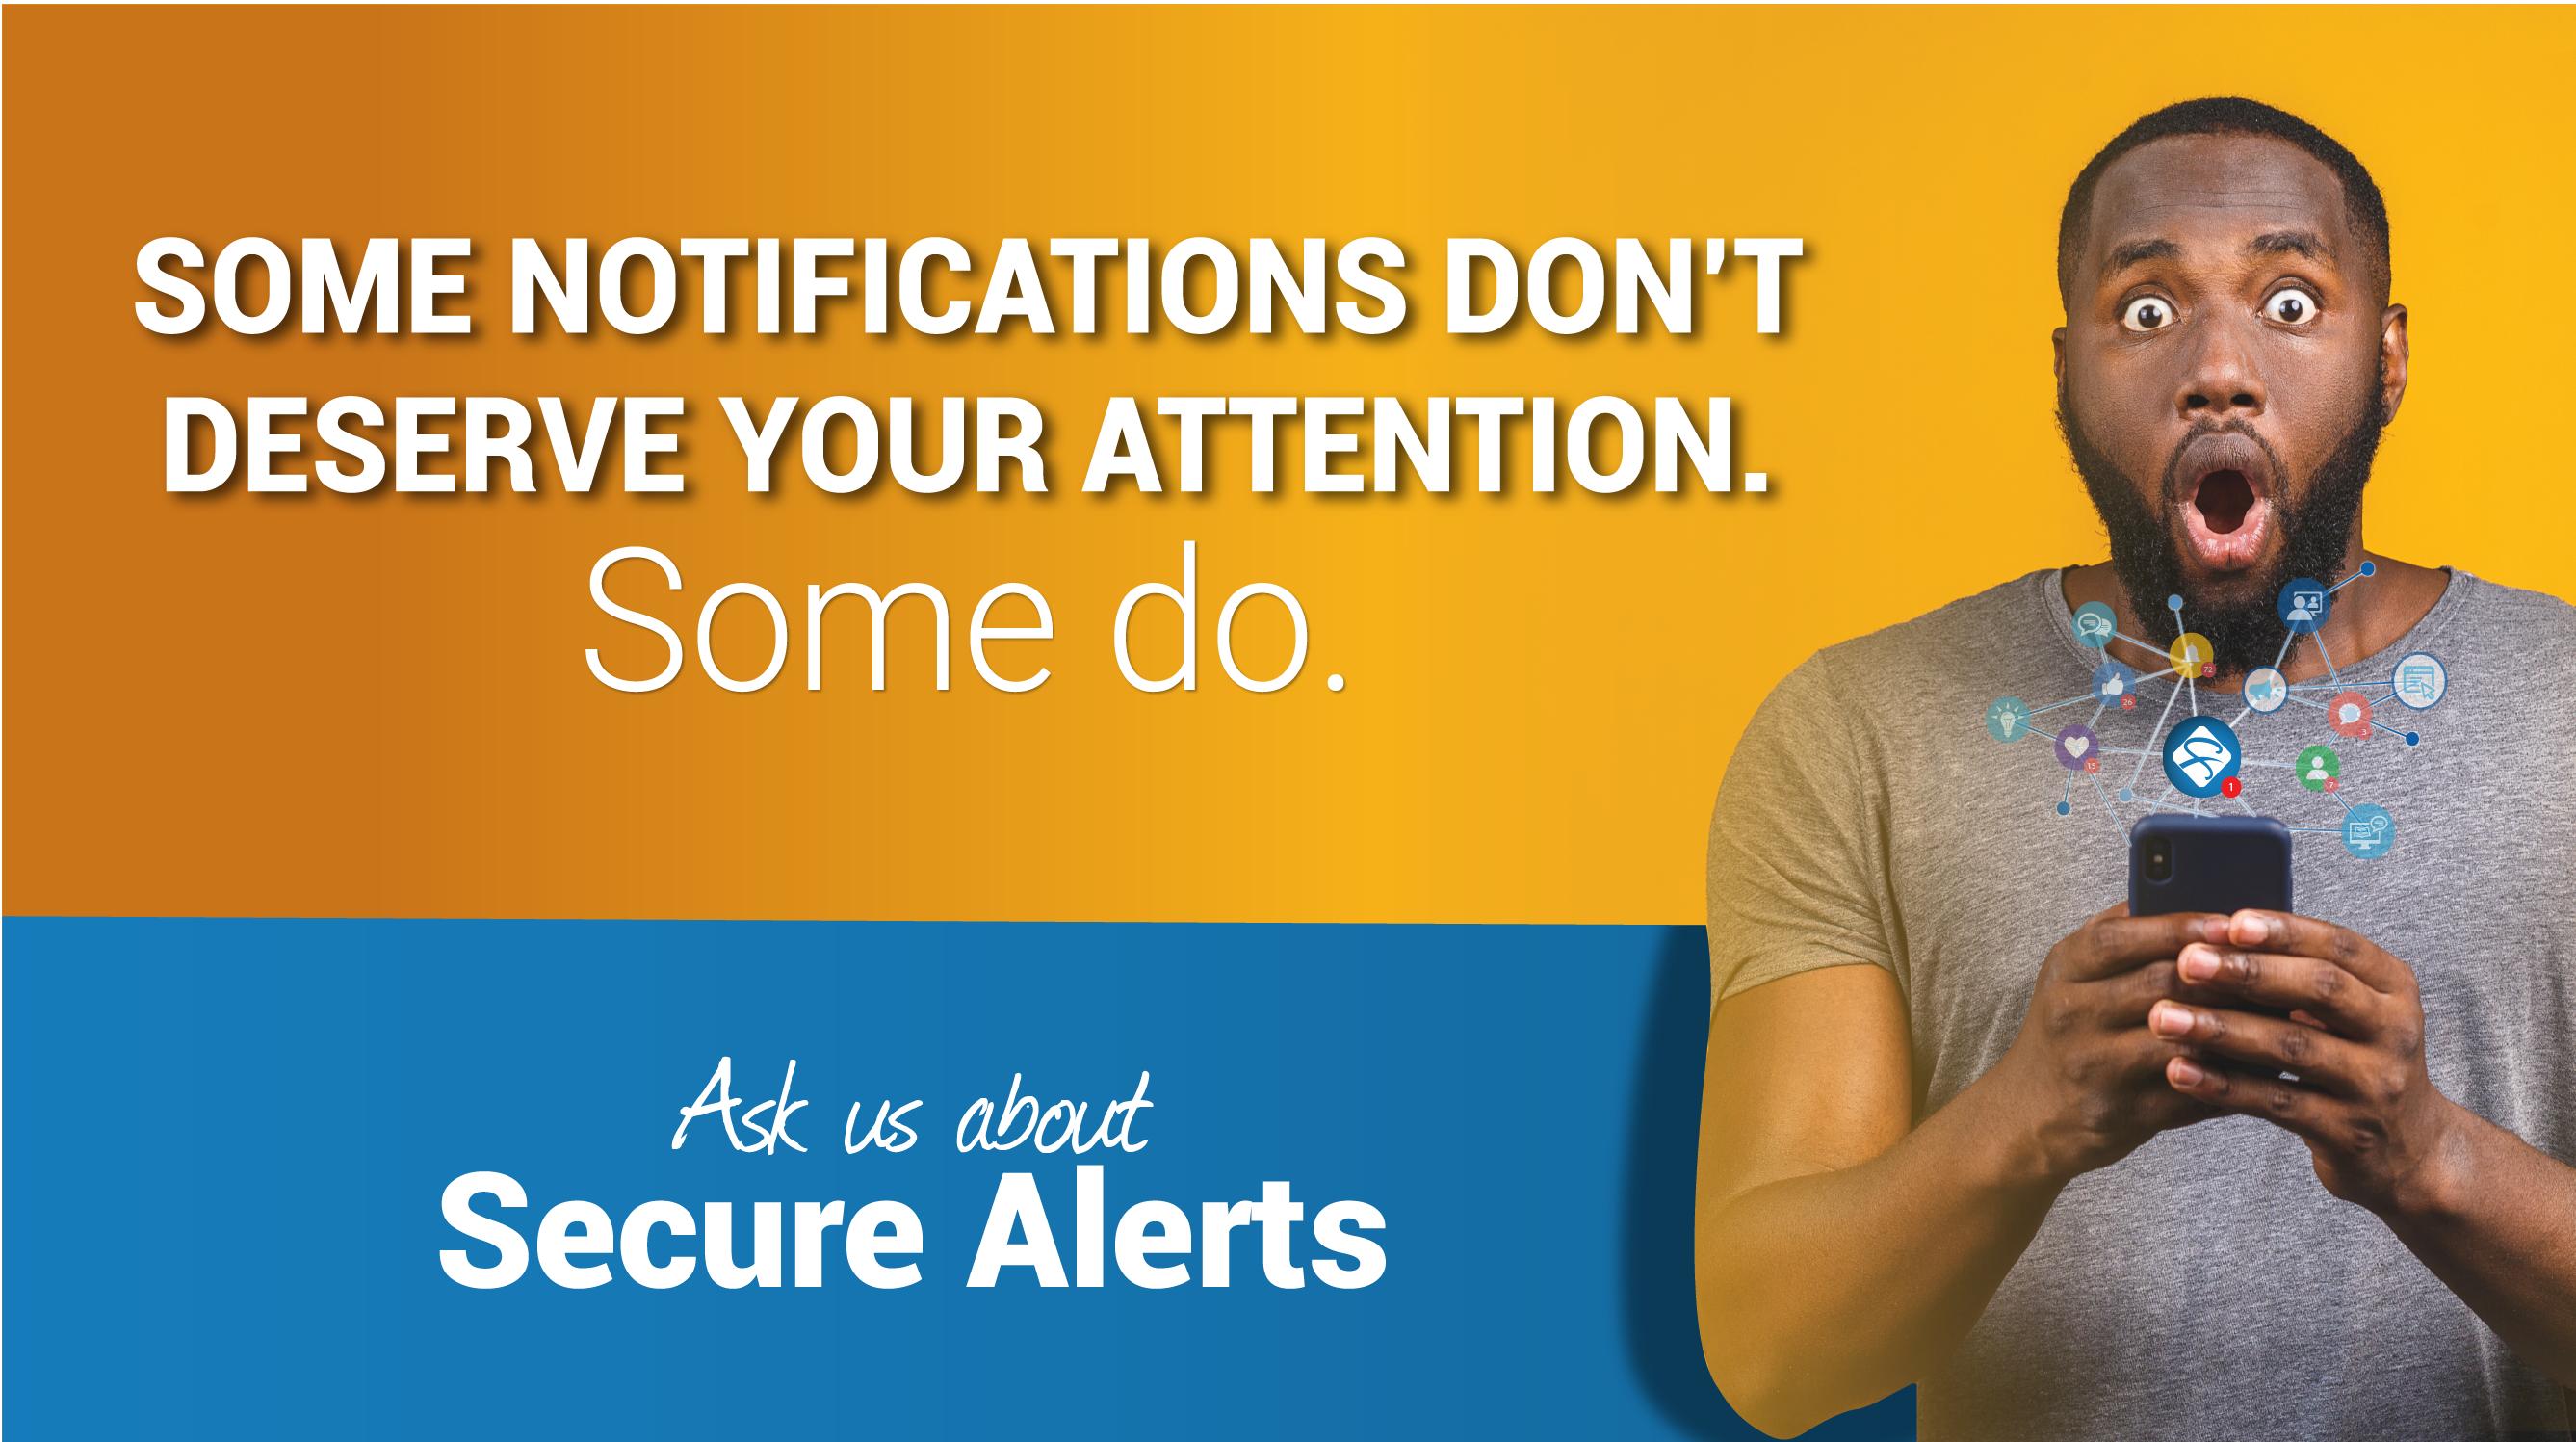 Secure Alerts